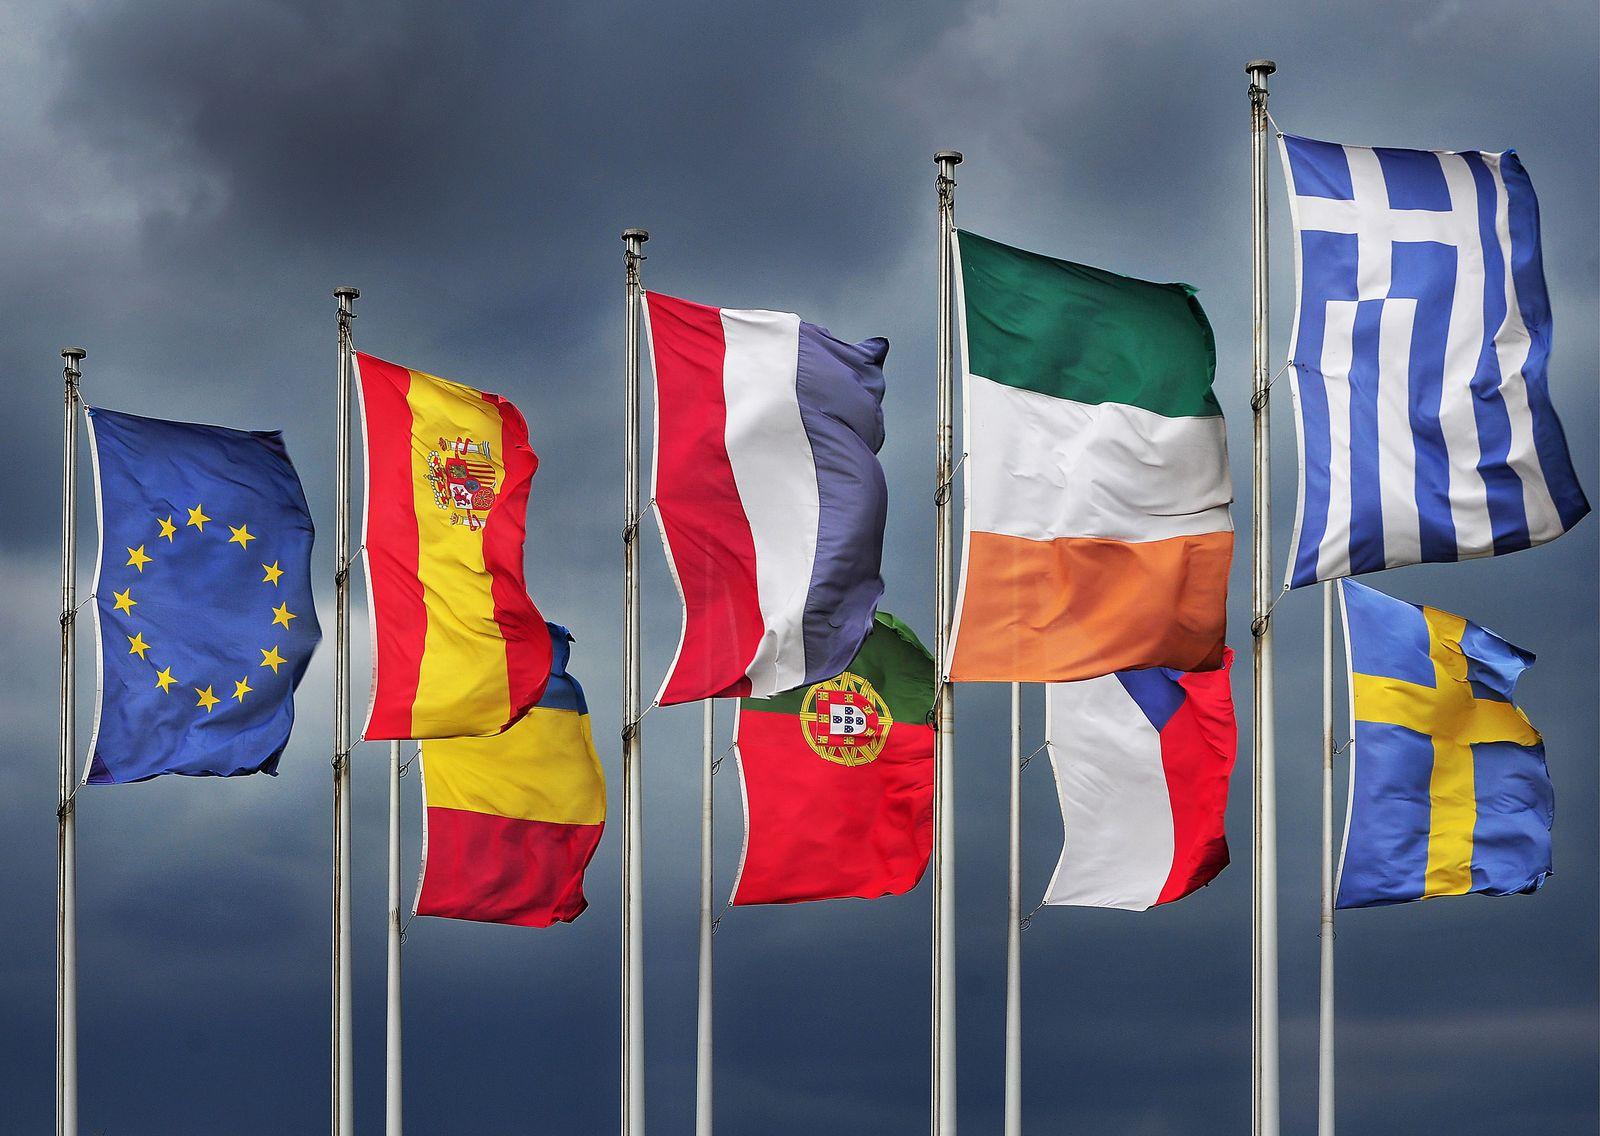 NICHT VERWENDEN Portugal / Finanzkrise / Euro-Austritt / EU-Flaggen